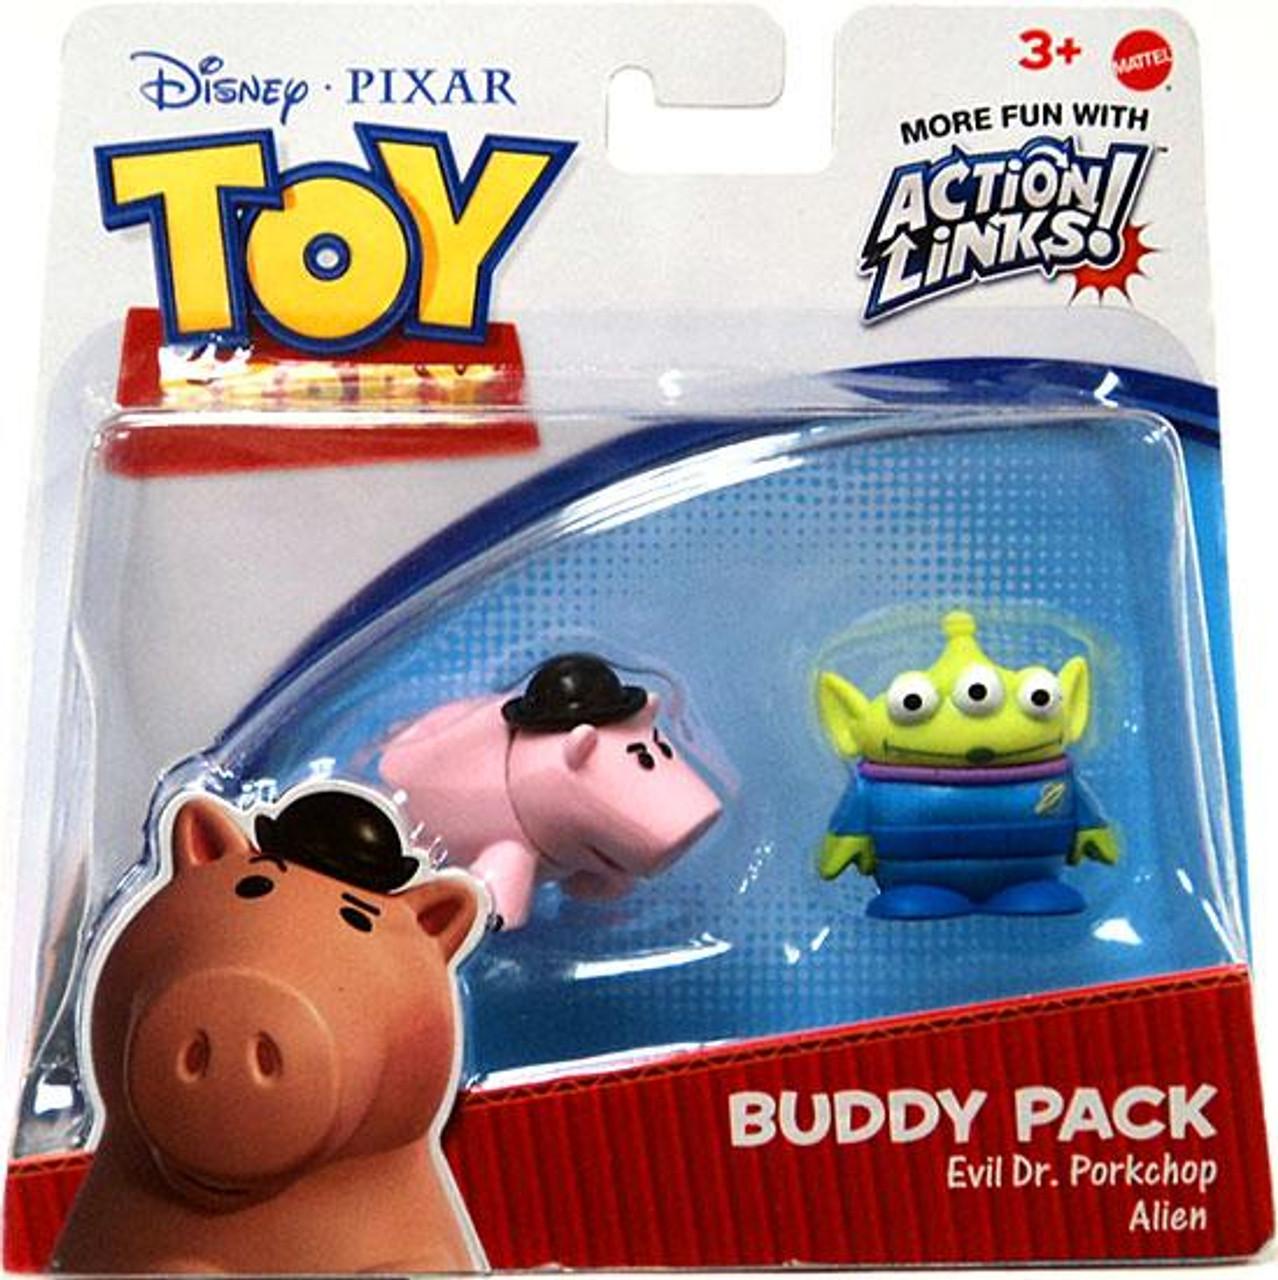 Toy Story Action Links Buddy Pack Evil Dr. Porkchop & Alien Exclusive Mini Figure 2-Pack